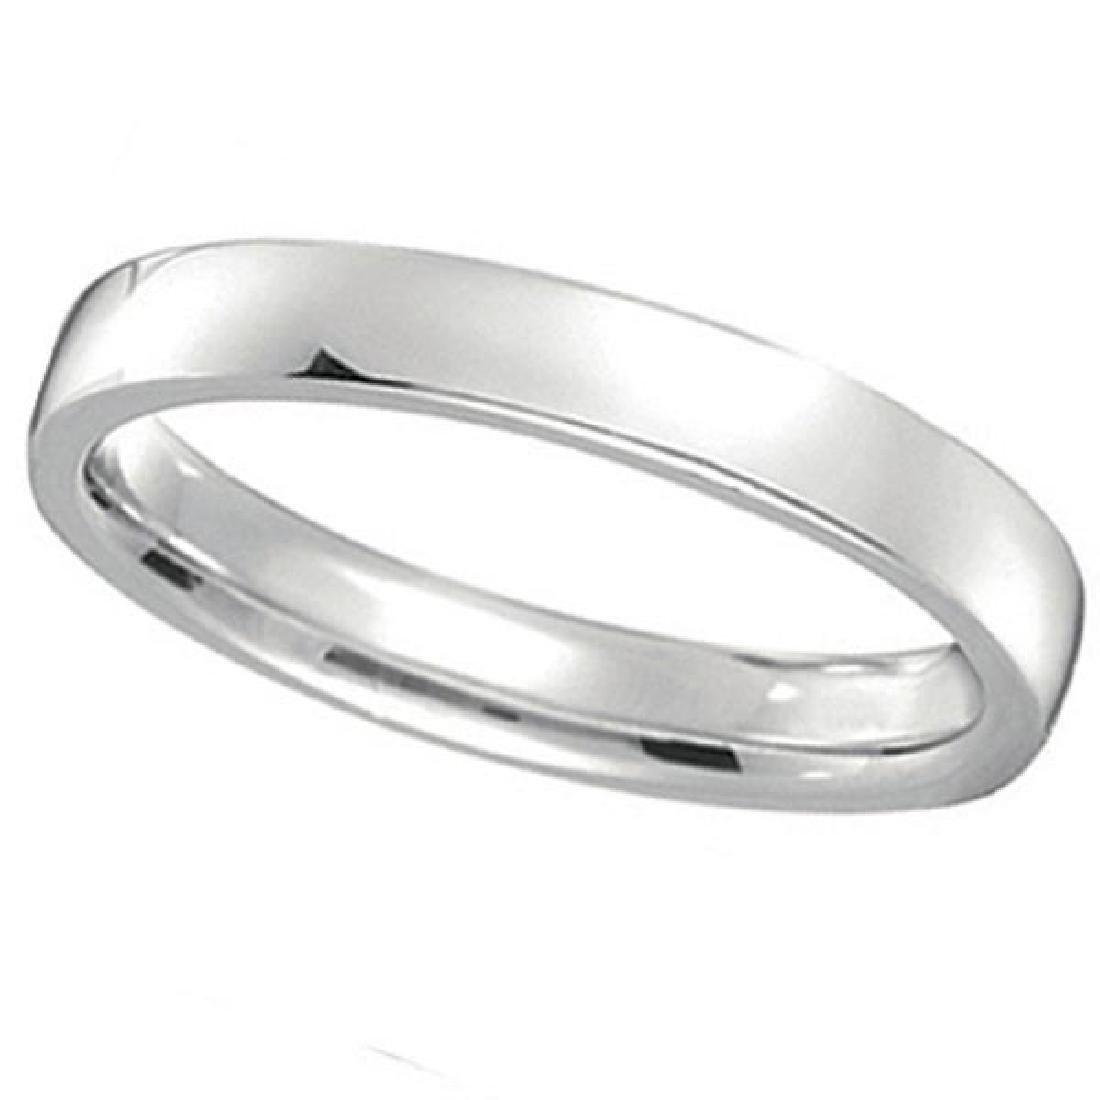 Palladium Wedding Ring Band Low Dome Comfort Fit (3mm)